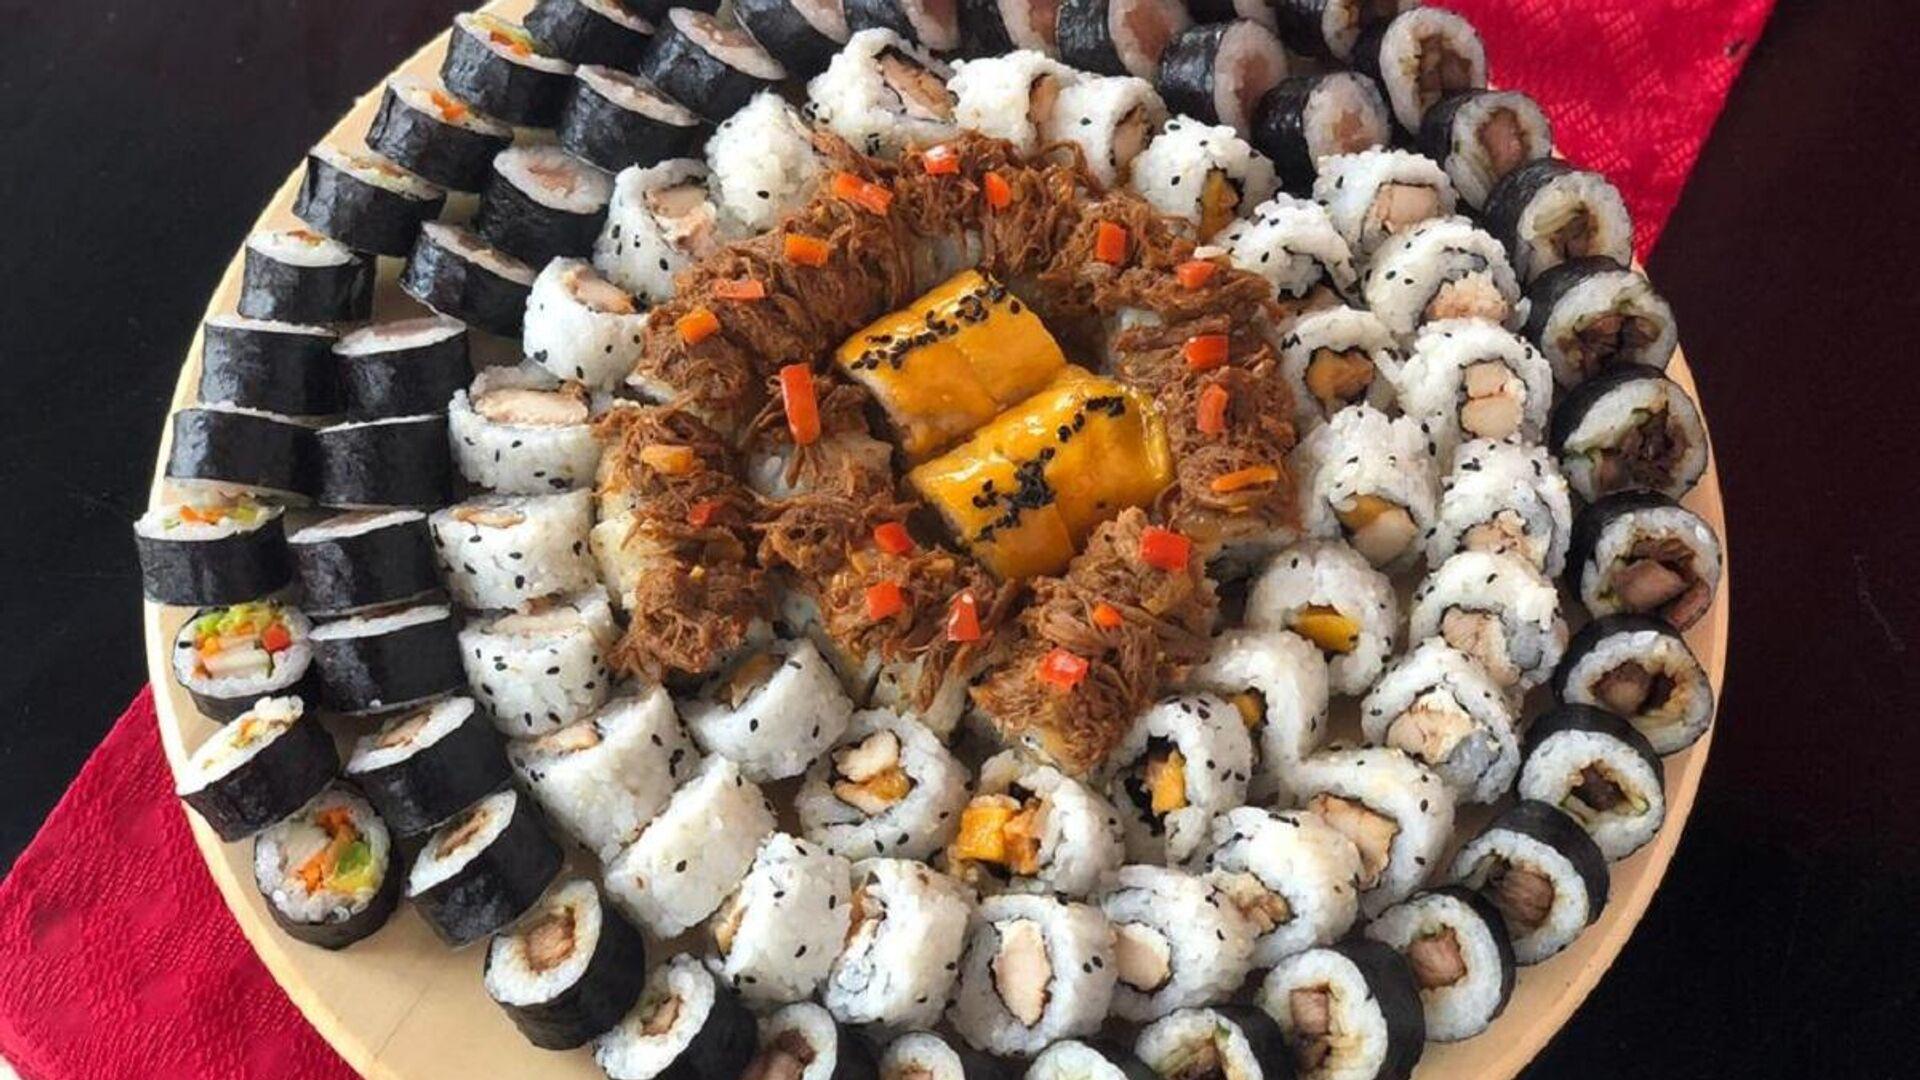 Sushi con ingredientes cubanos - Sputnik Mundo, 1920, 15.03.2021